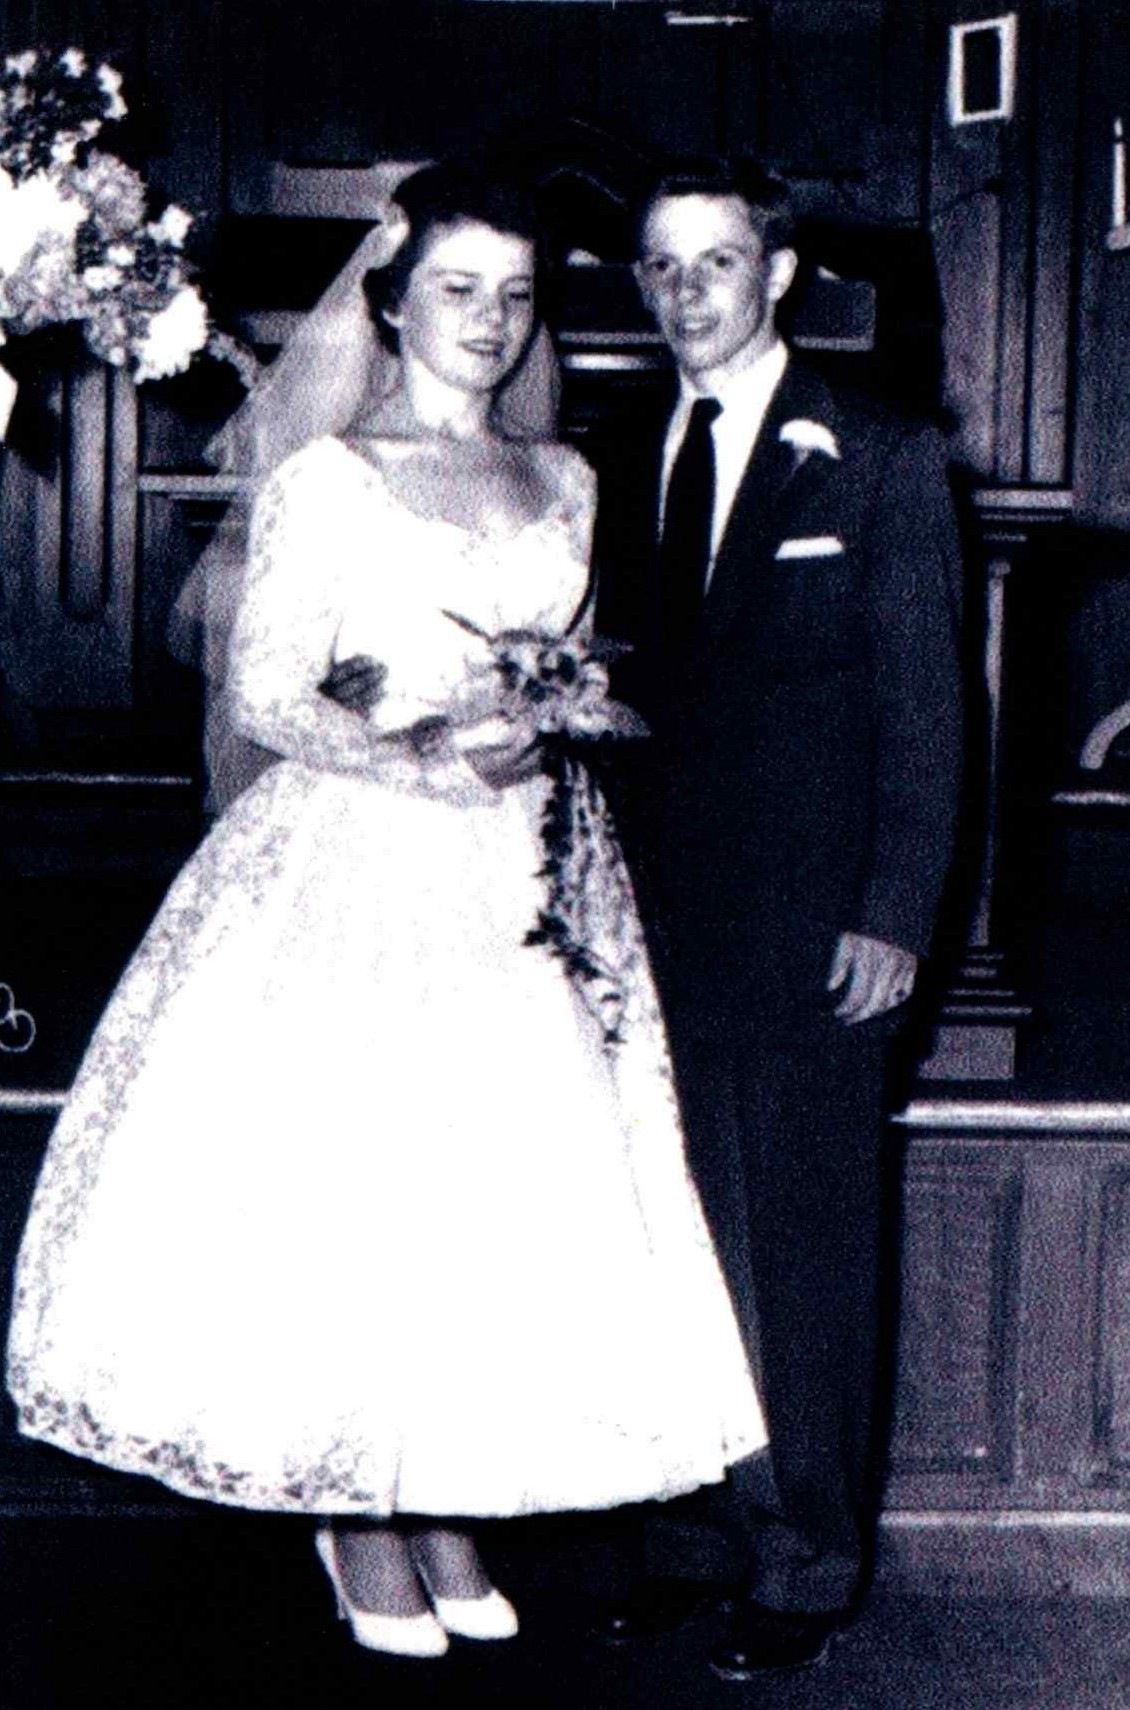 Neil and Elizabeth Wedding Photo